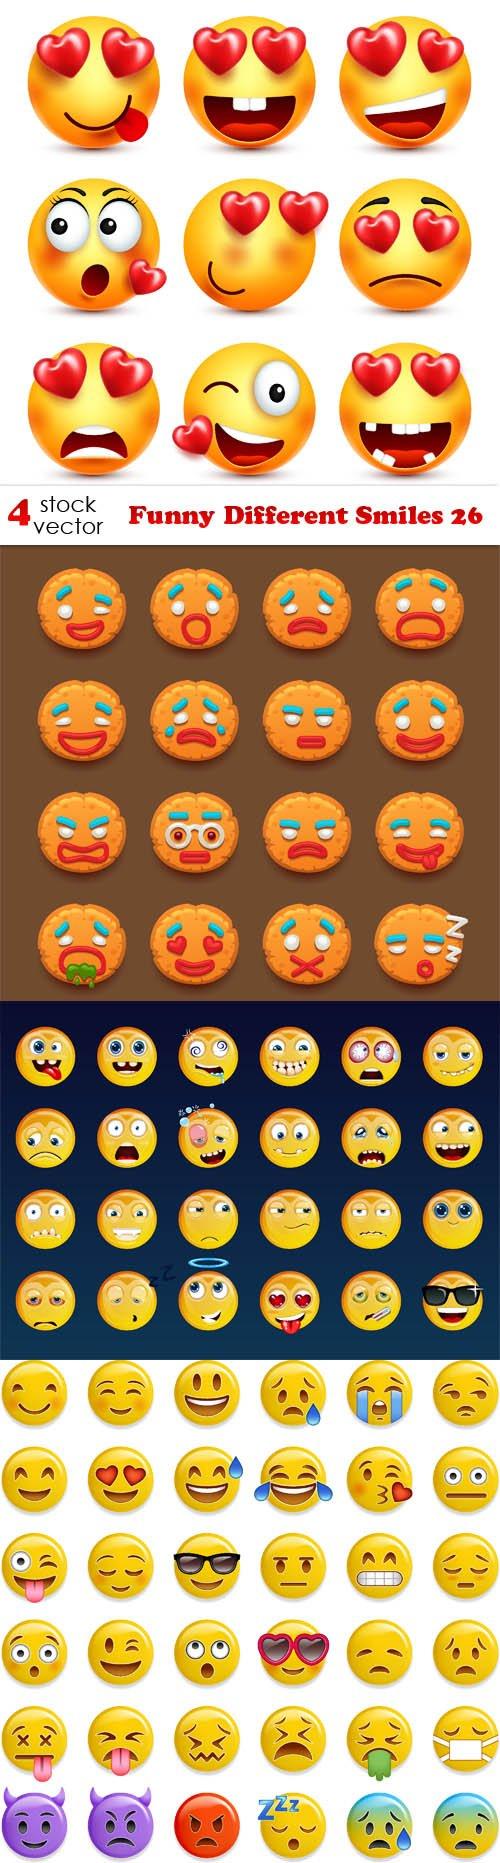 Vectors - Funny Different Smiles 26